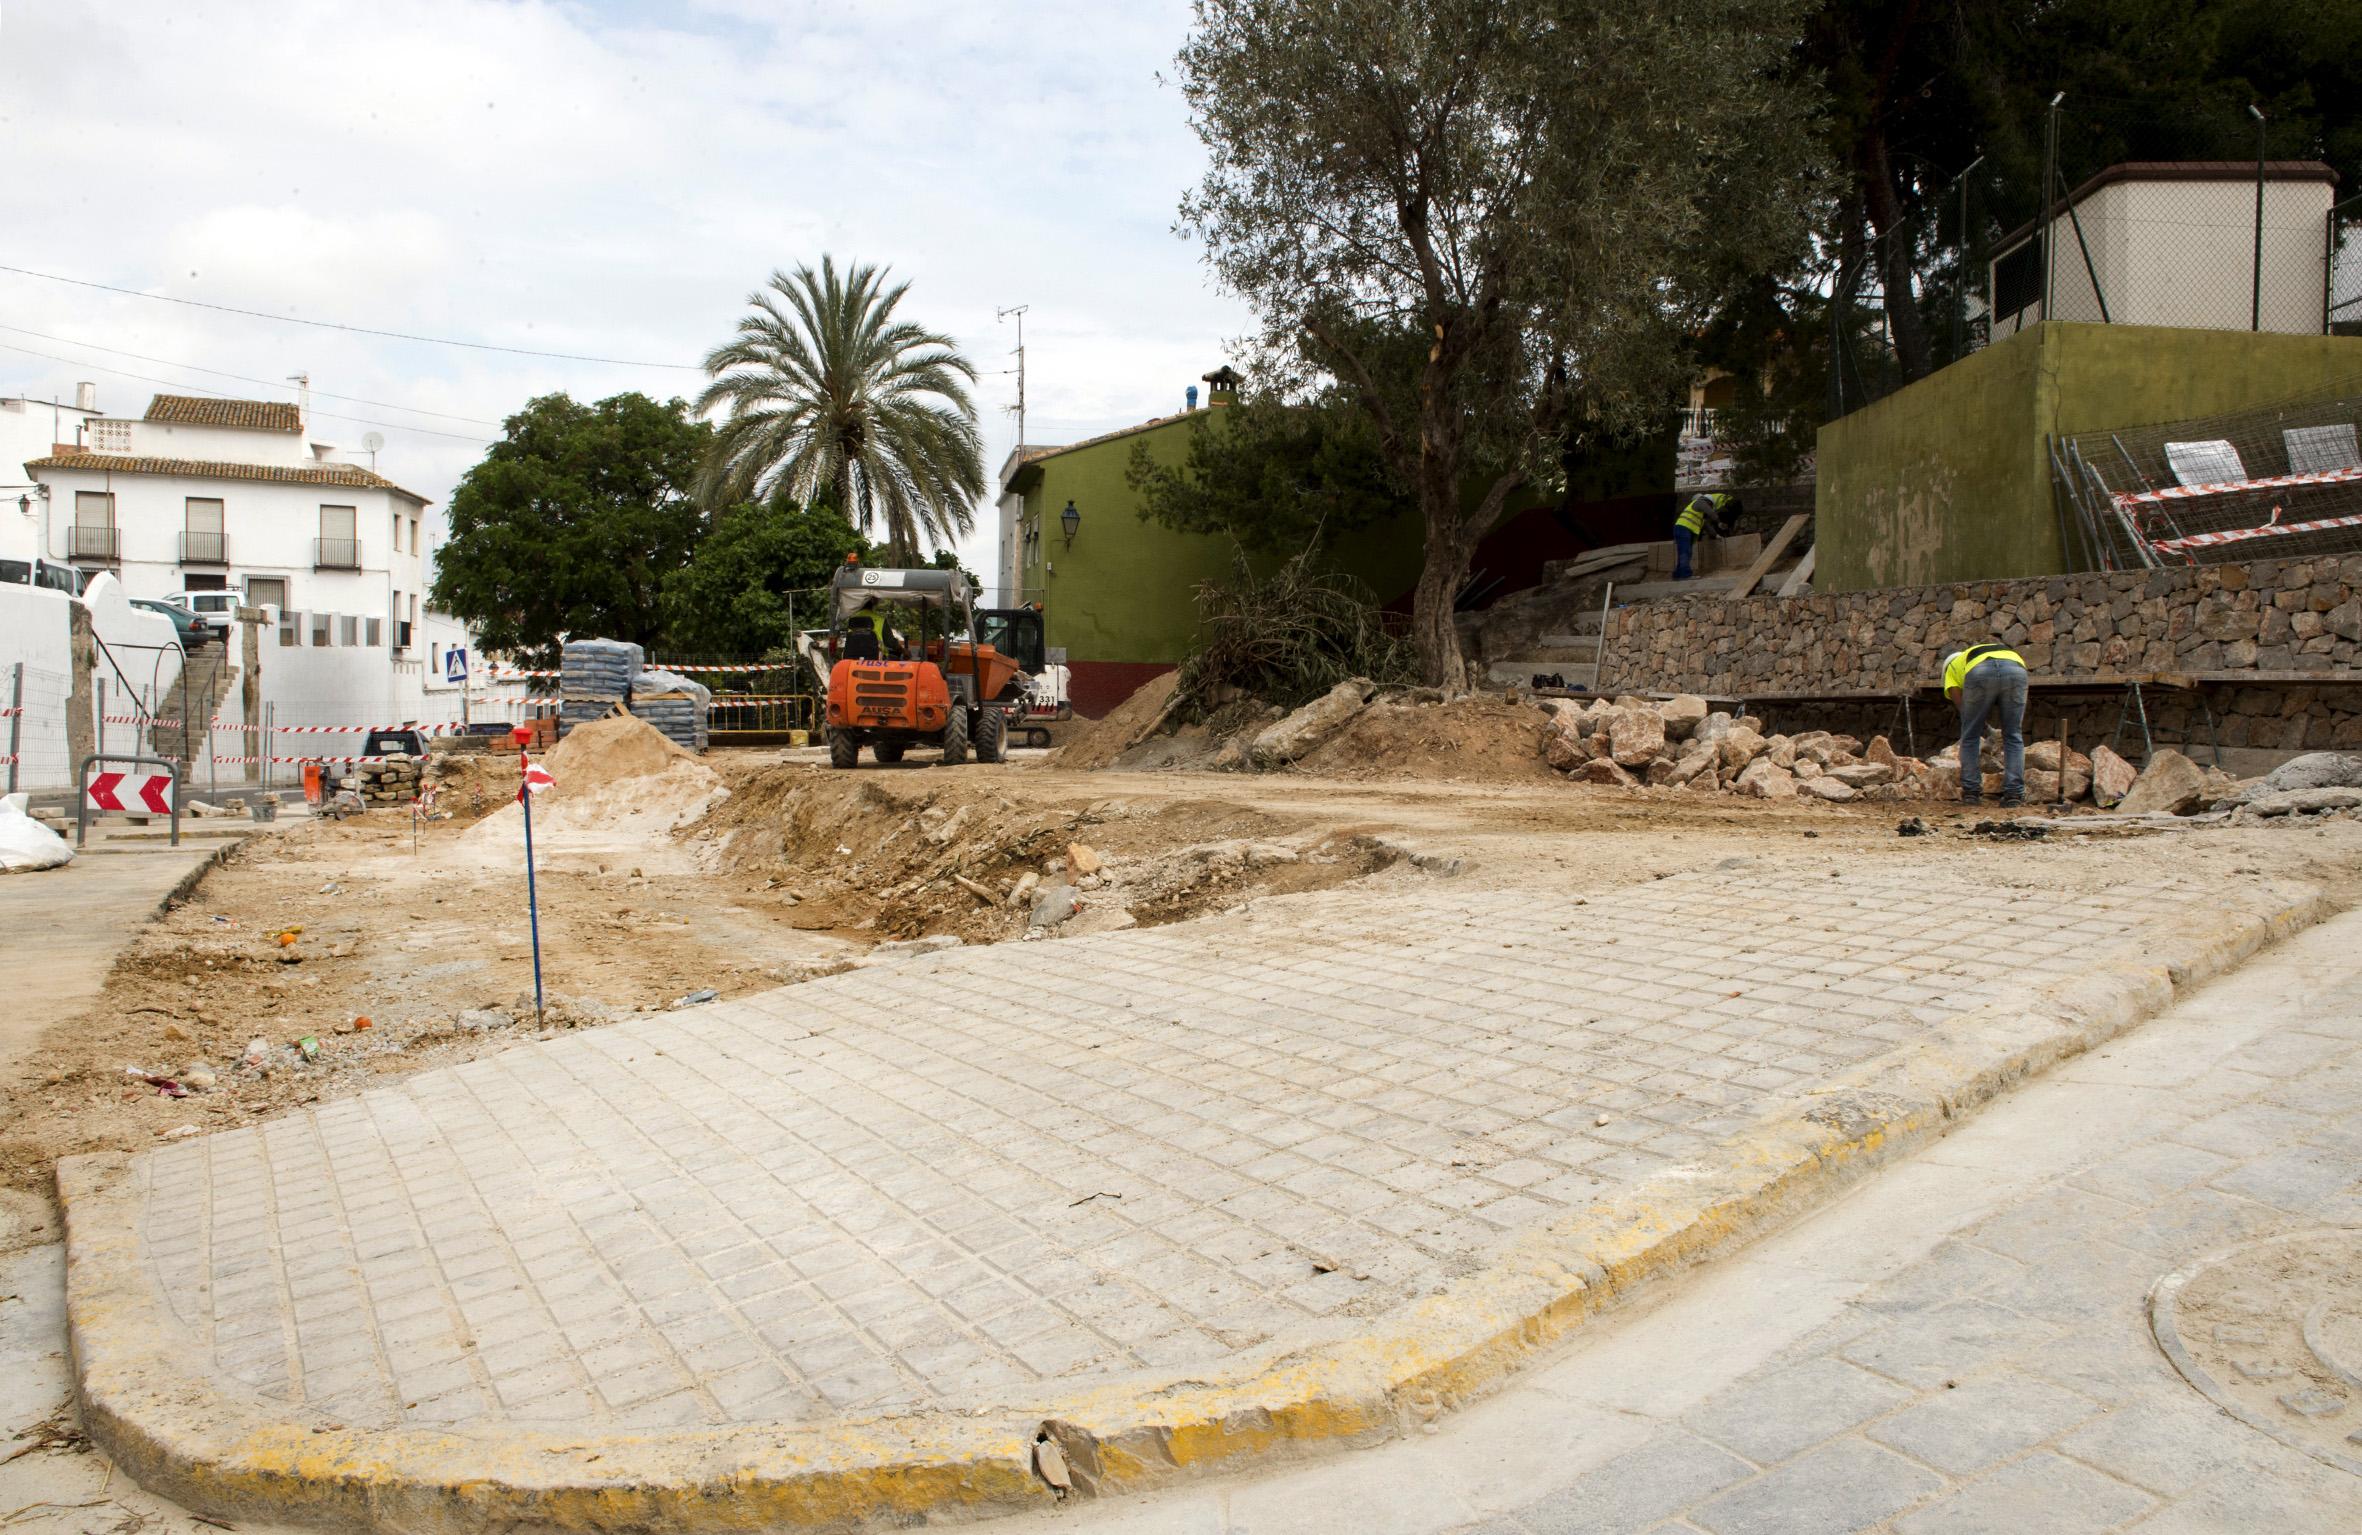 Obras ejecutadas a través del PIFS de la Diputación de Valencia.